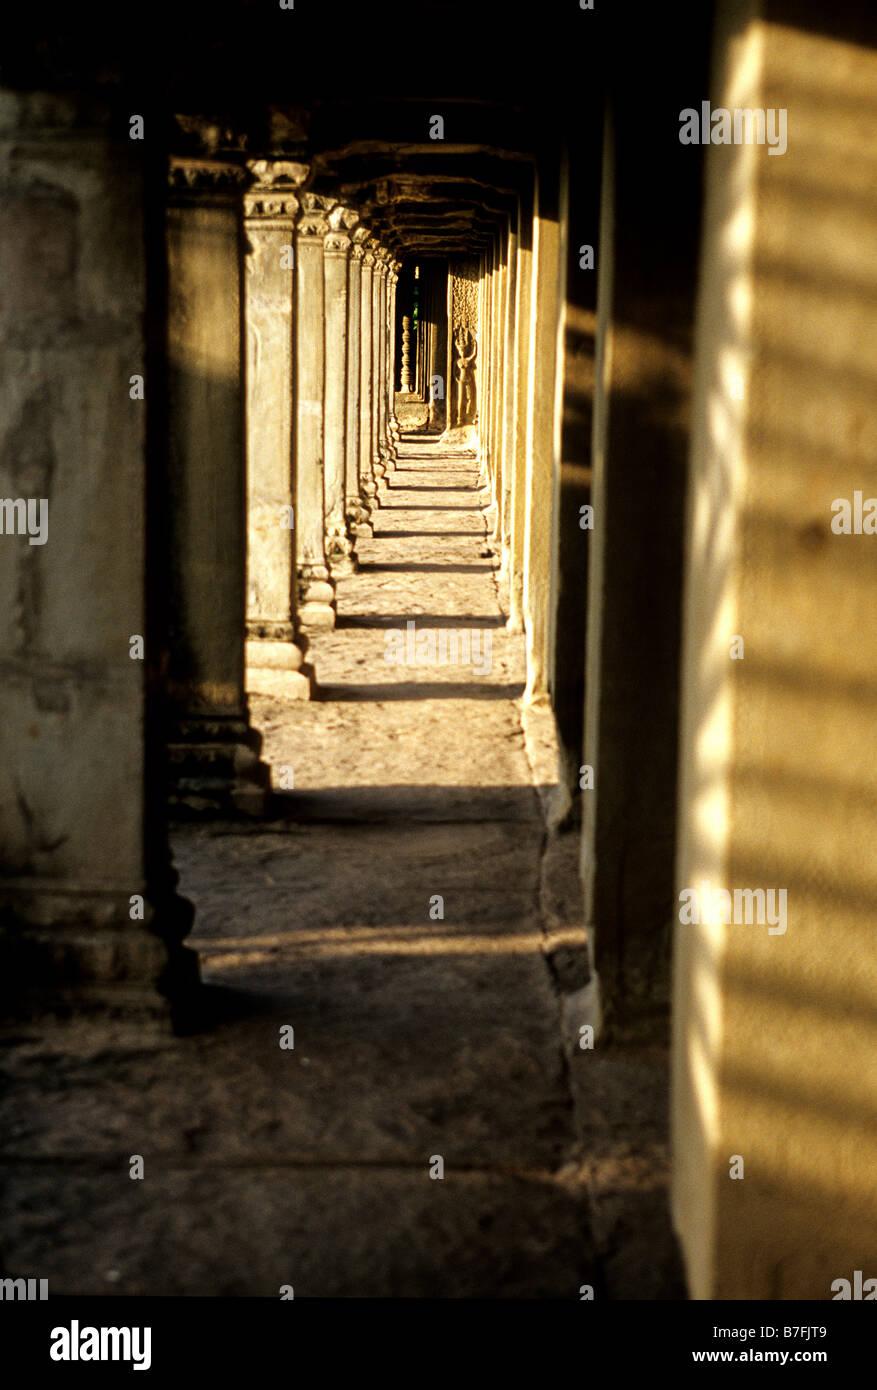 Ruins of  the 12th century Khmer temple of Angkor Wat- Angkor Wat ruins near Siem Reap, Cambodia - Stock Image